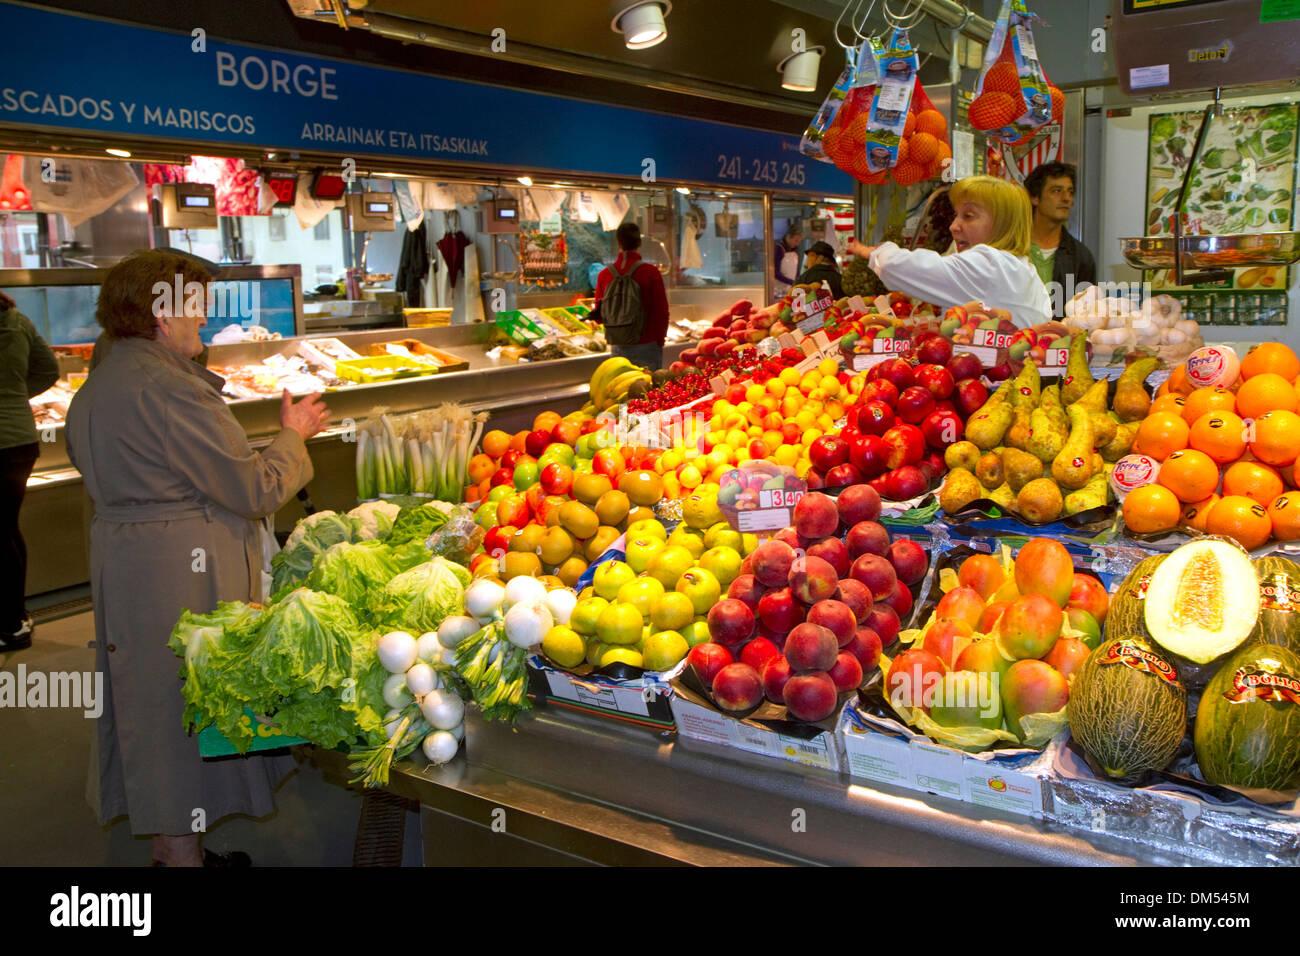 Produce vendor at the Mercado de la Ribera along the Nervion River at Bilbao, Biscay, Spain. - Stock Image